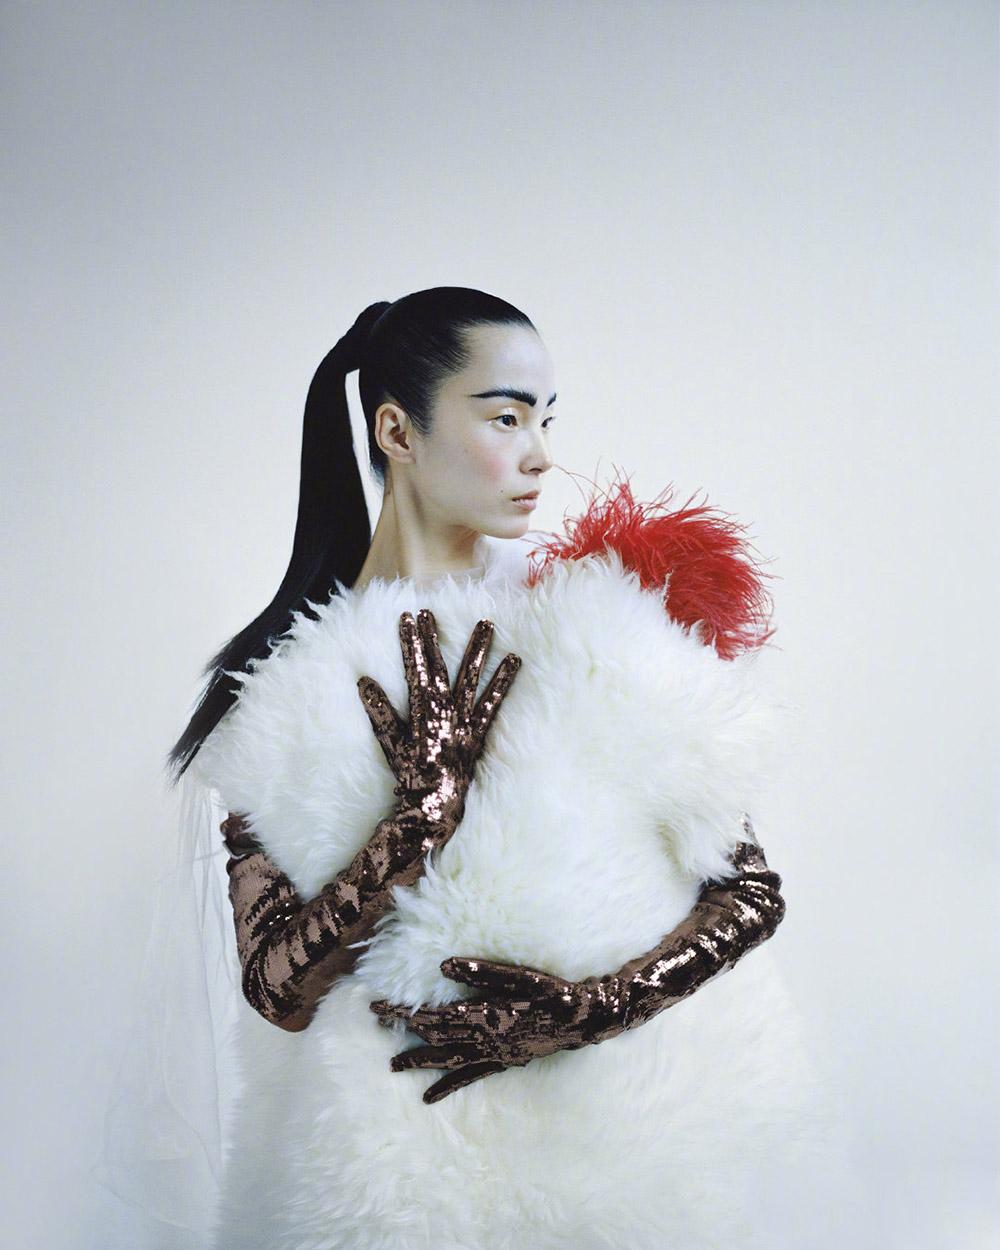 Xiao Wen Ju covers Vogue China January 2021 by Leslie ZhangXiao Wen Ju covers Vogue China January 2021 by Leslie Zhang